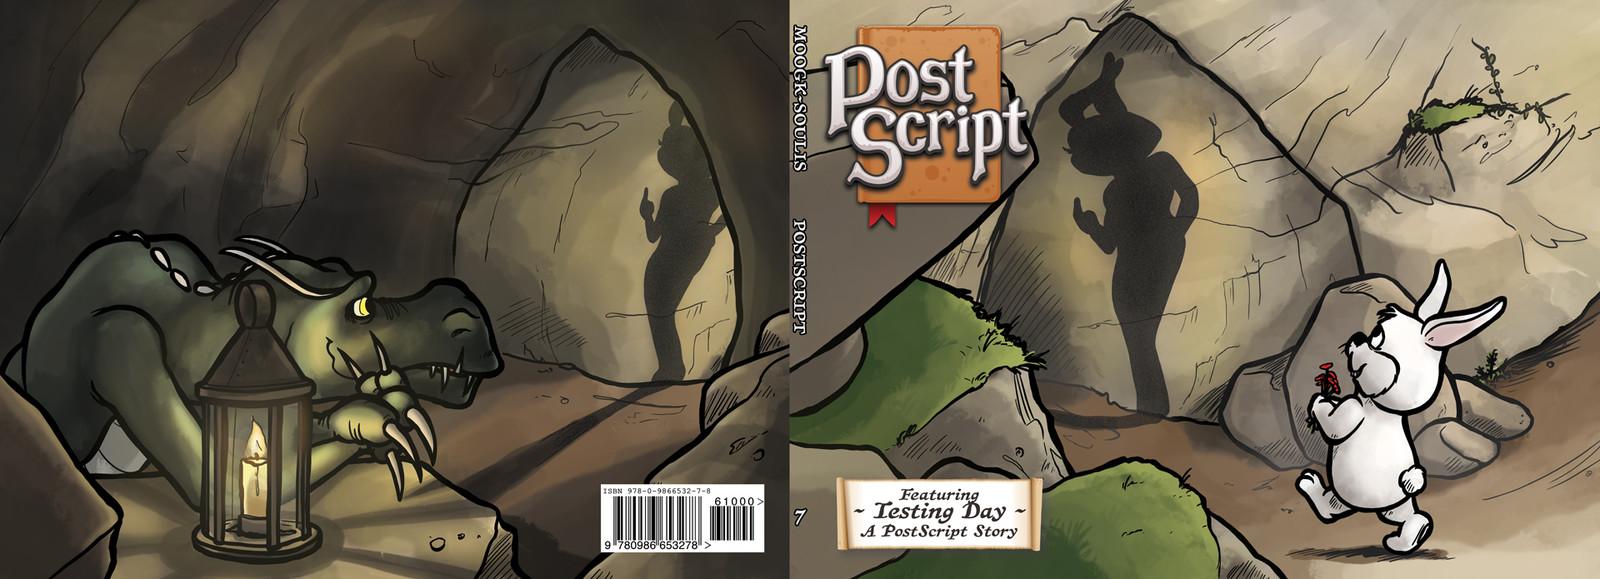 PostScript Book 7 Cover